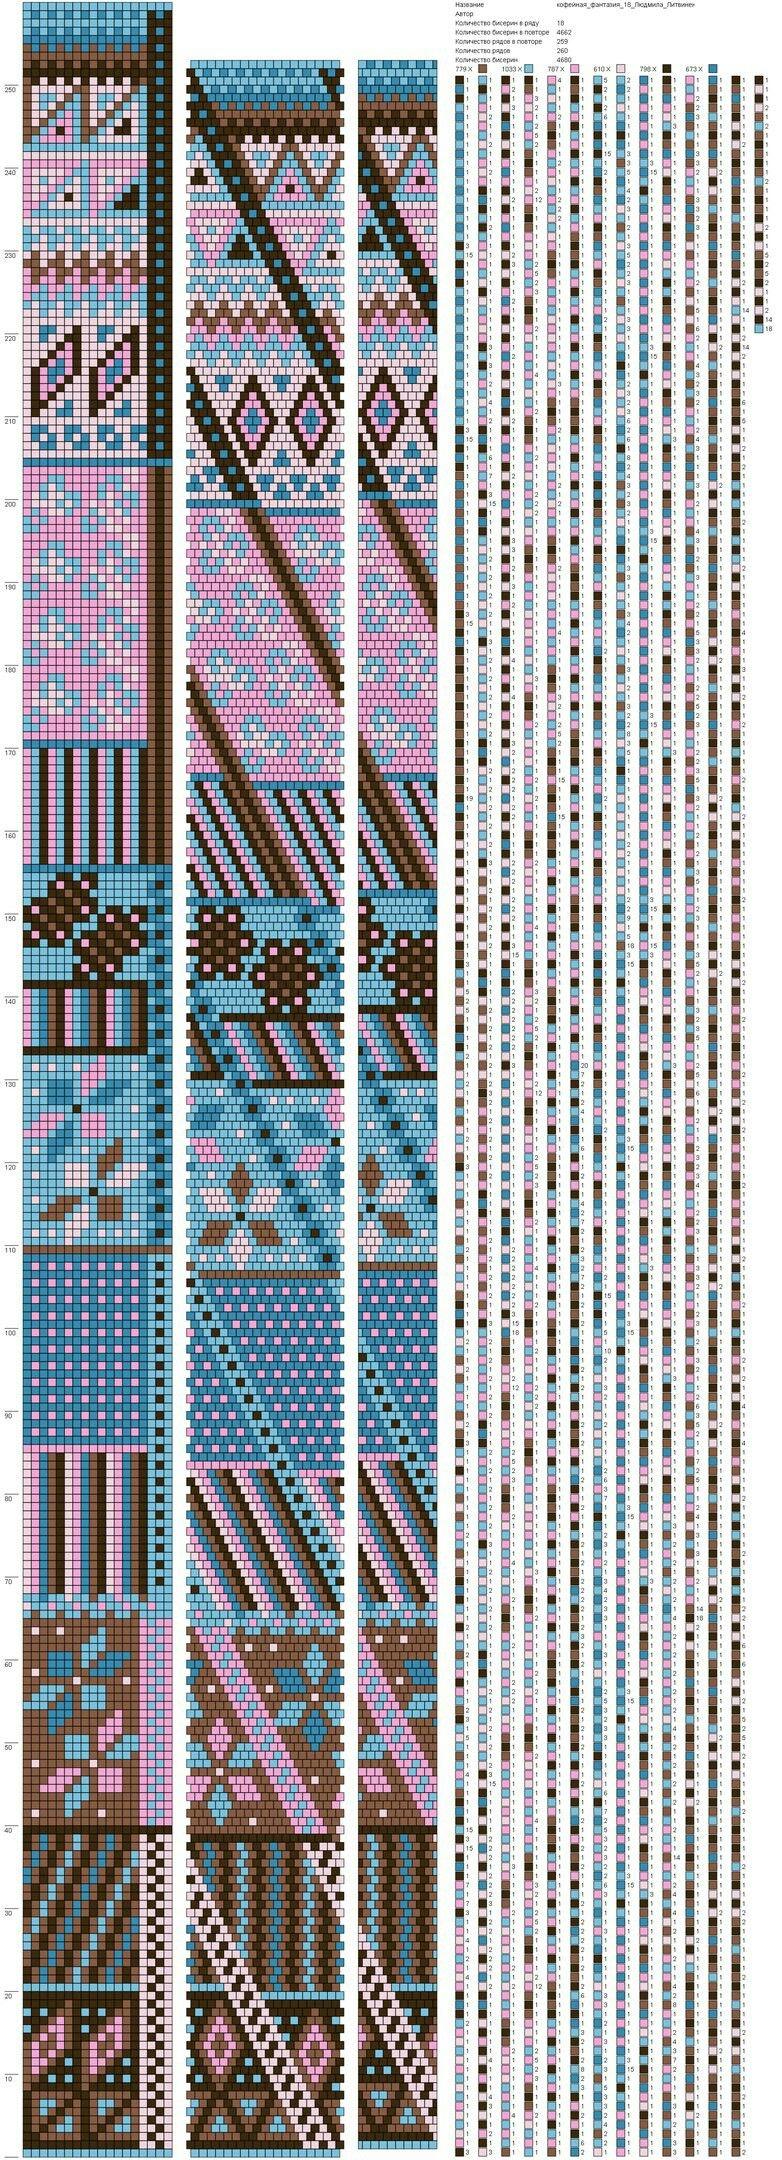 Pin von Ludmila Nefedova auf Beads | Pinterest | Perlenkette ...